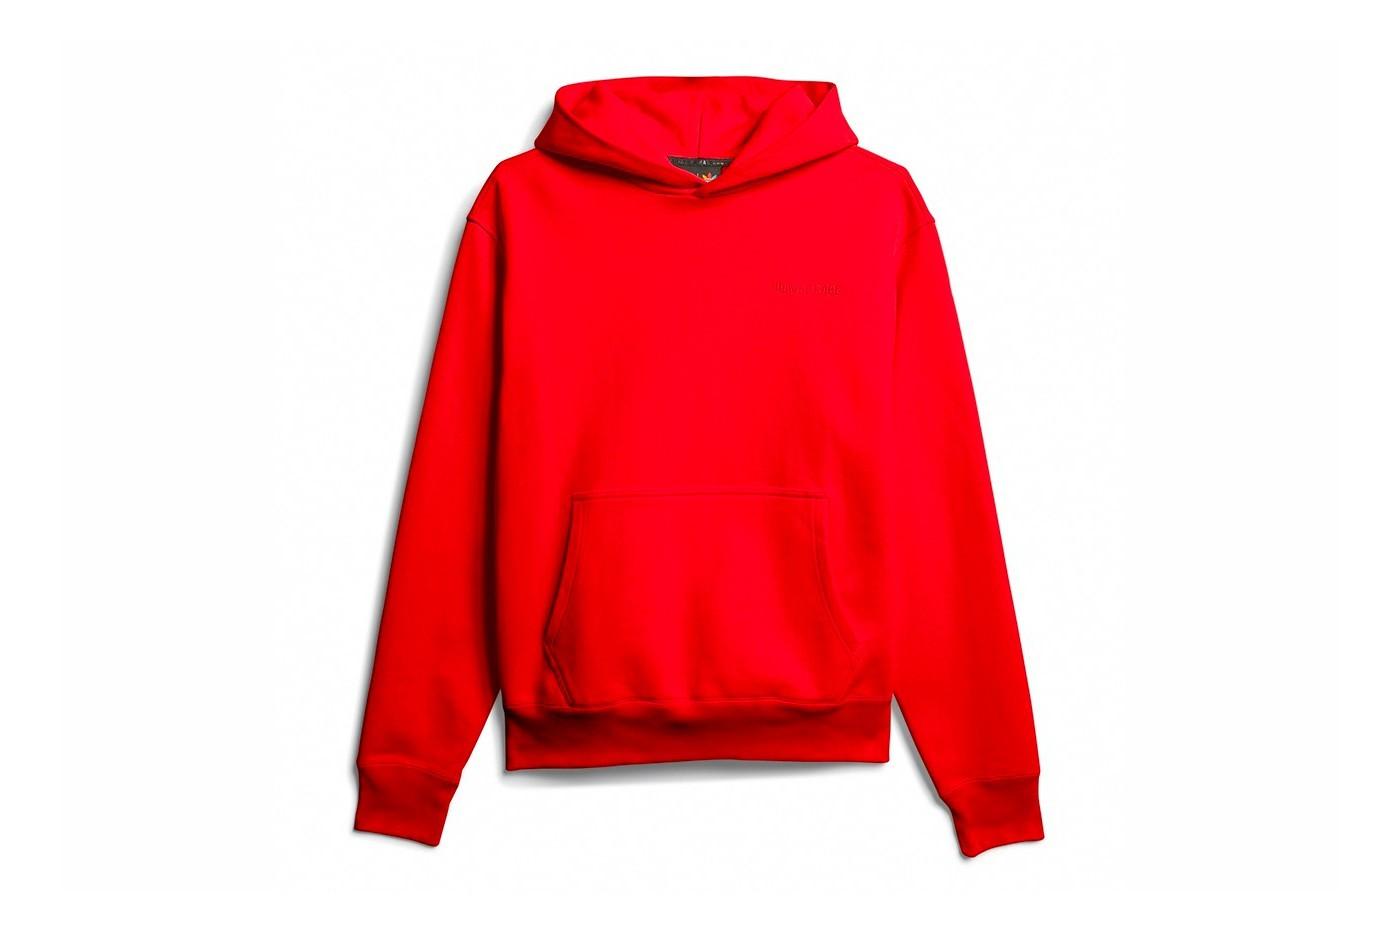 adidas x Pharrell Williams basic line hoodie red